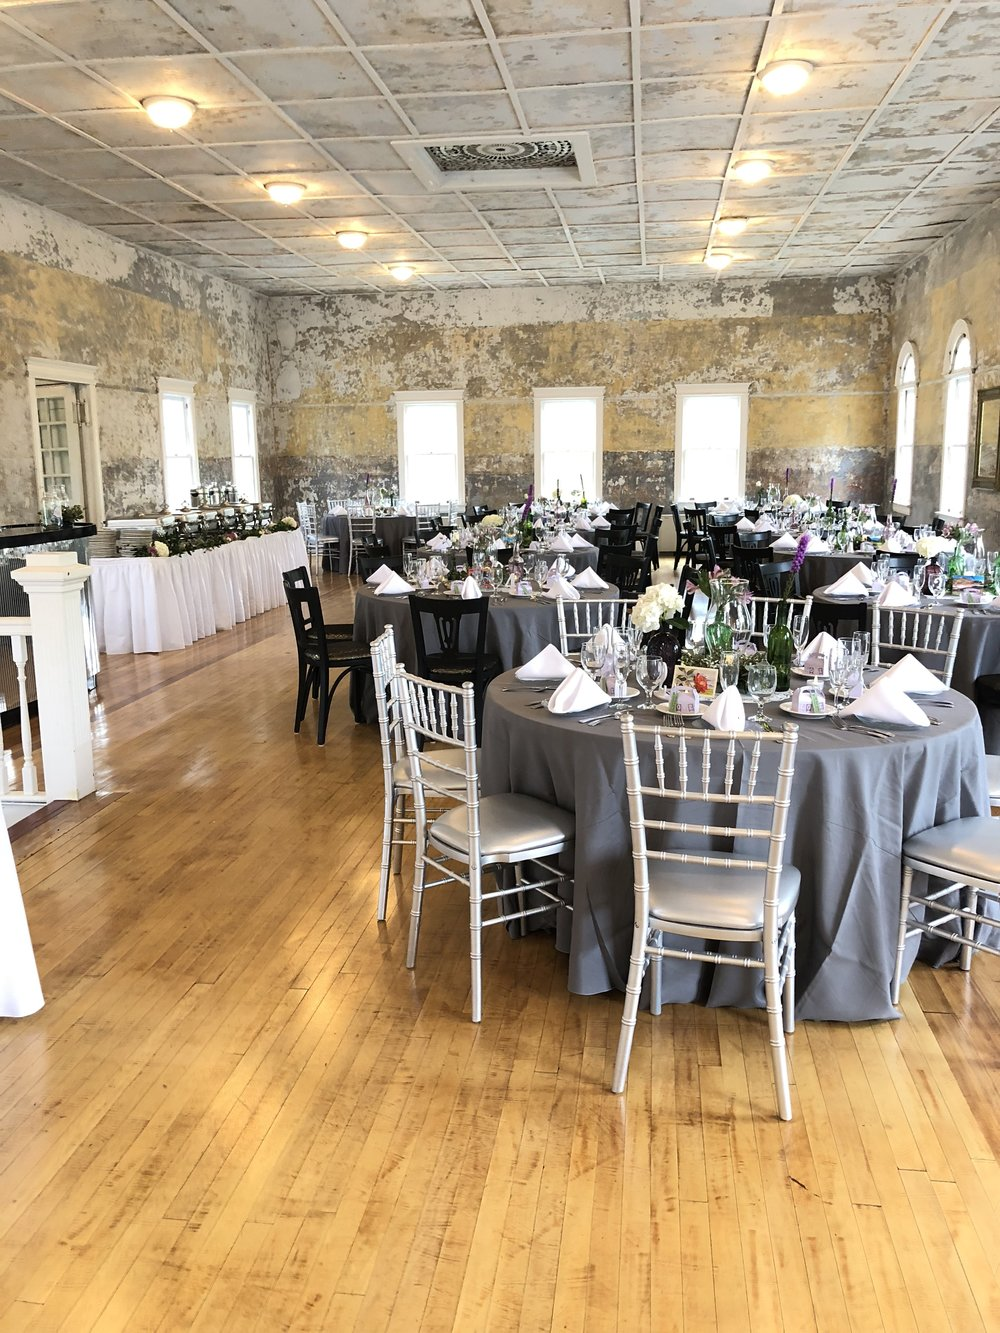 2018.05.19 Lefler Kasebier Wdg The Hall at Castle Inn DWG Final Floor Plan 11.jpg